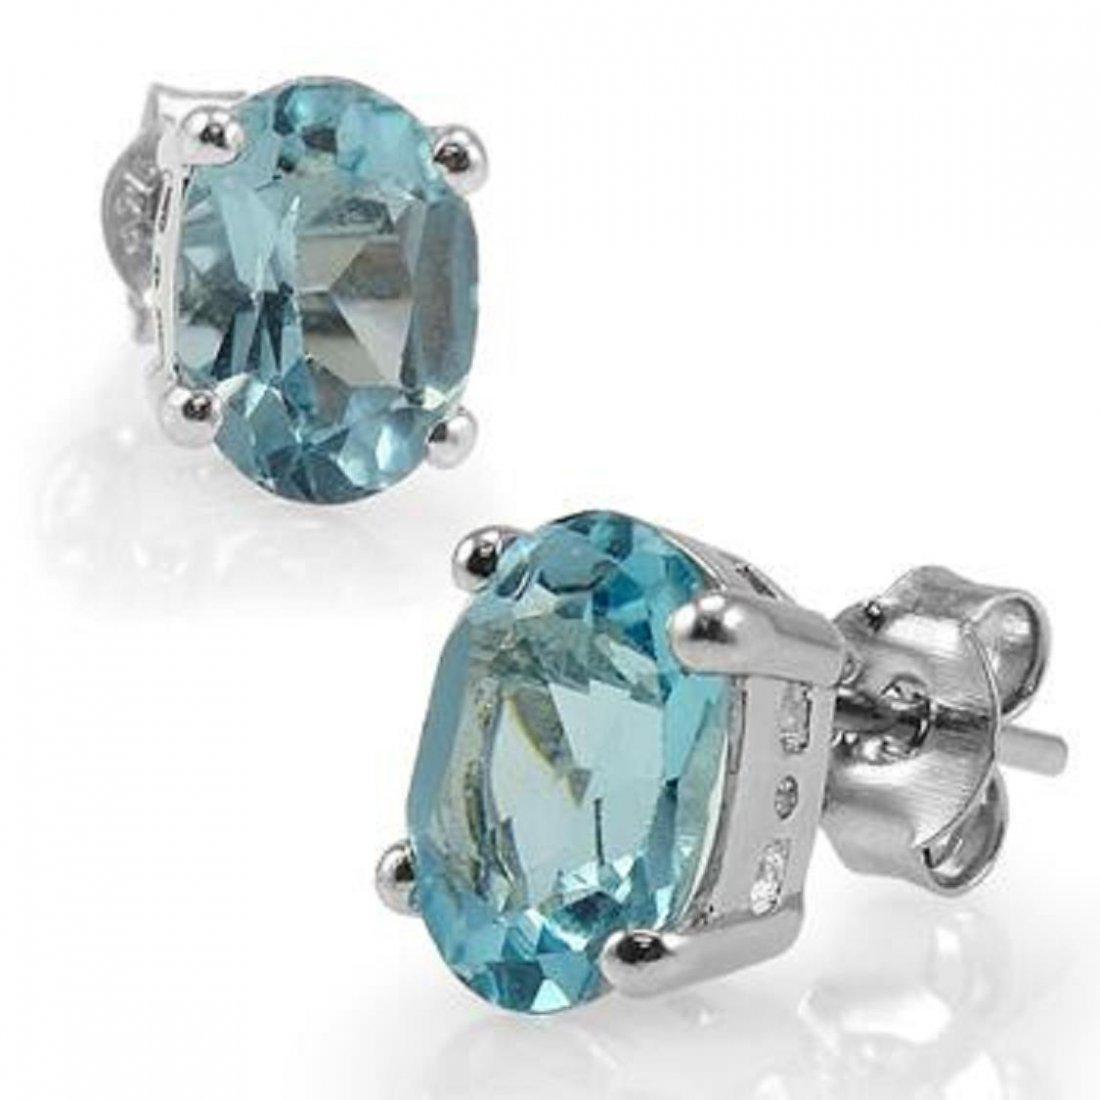 87: Genuine 3 CT Blue Topaz Earrings